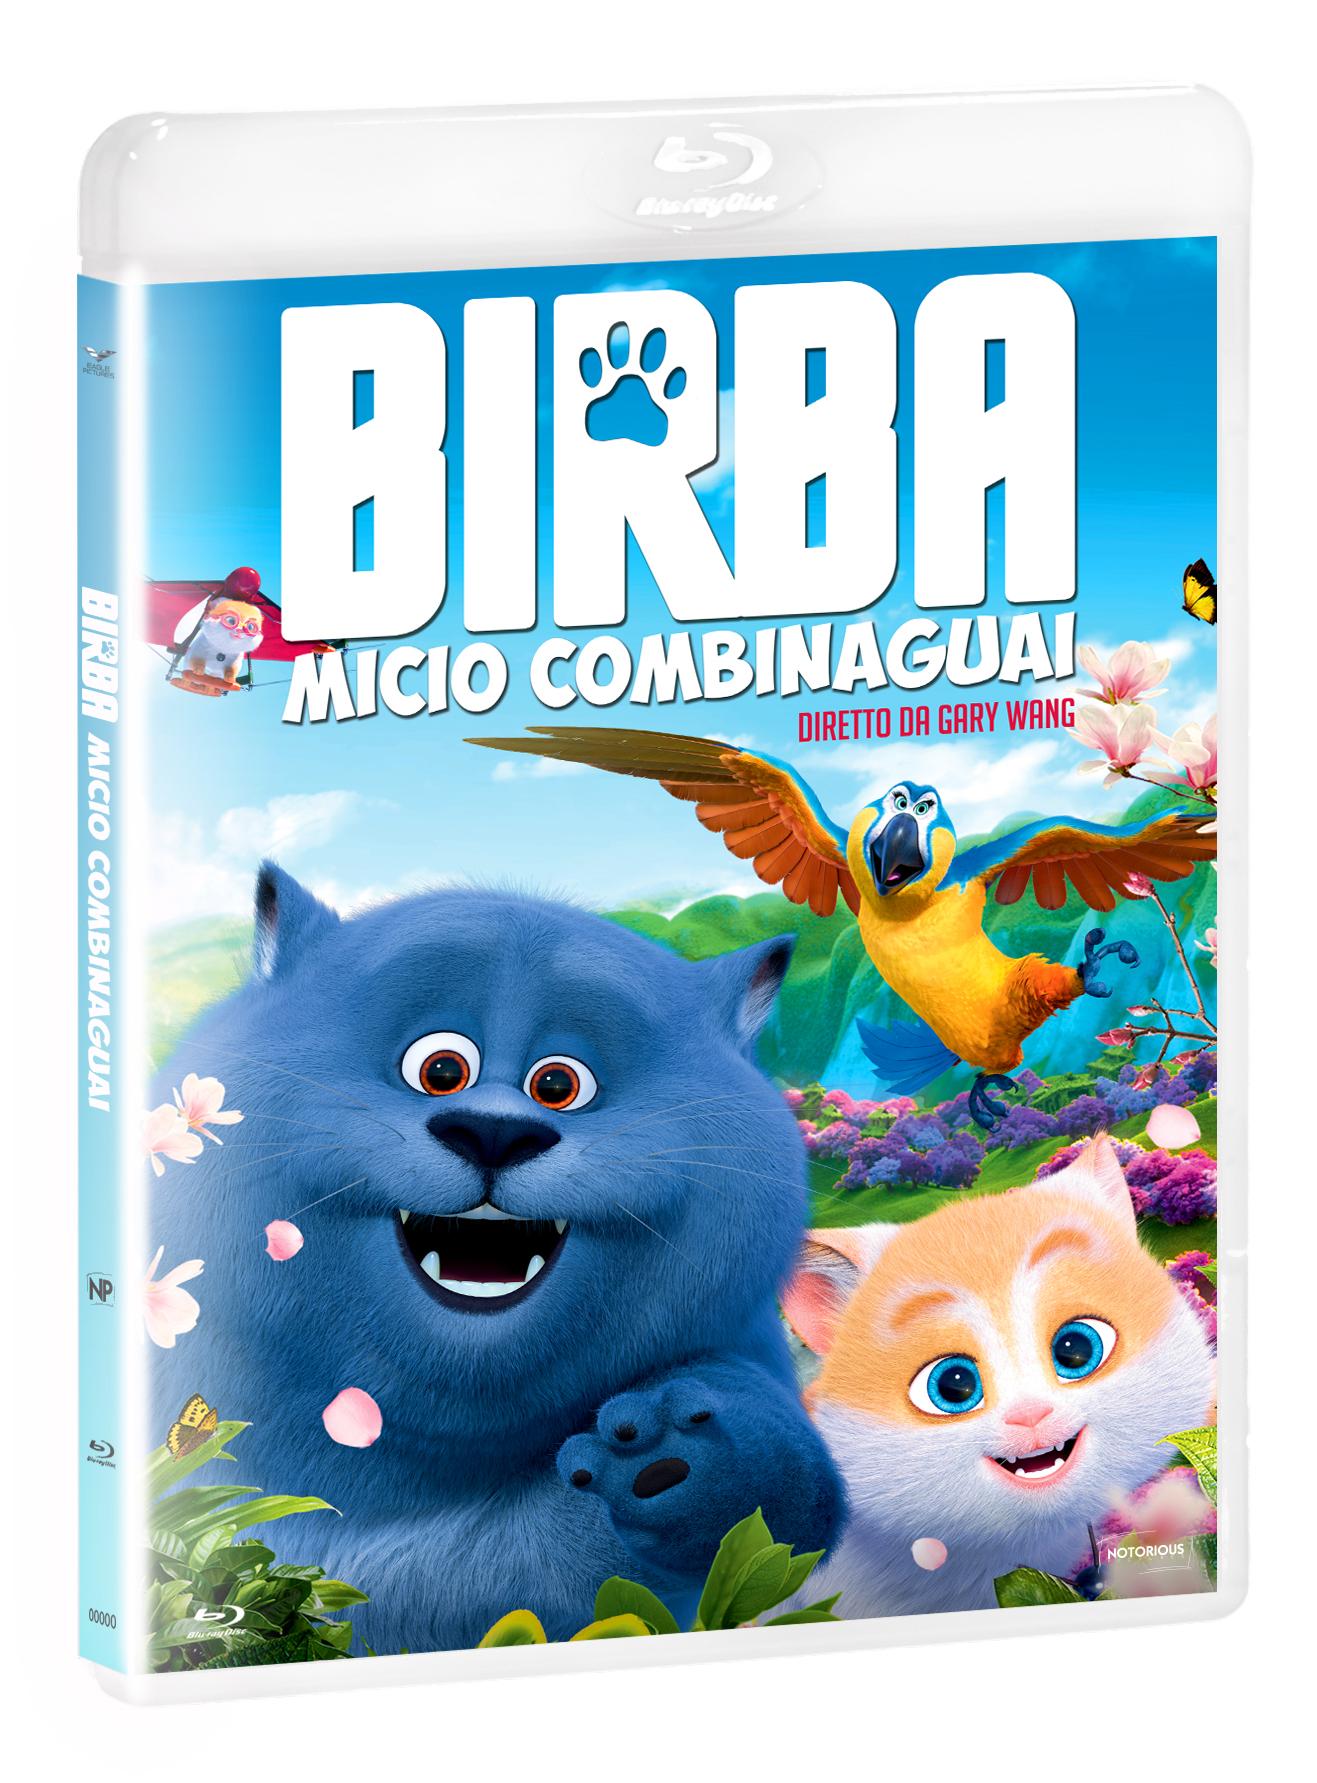 BIRBA - MICIO COMBINAGUAI - BLU RAY